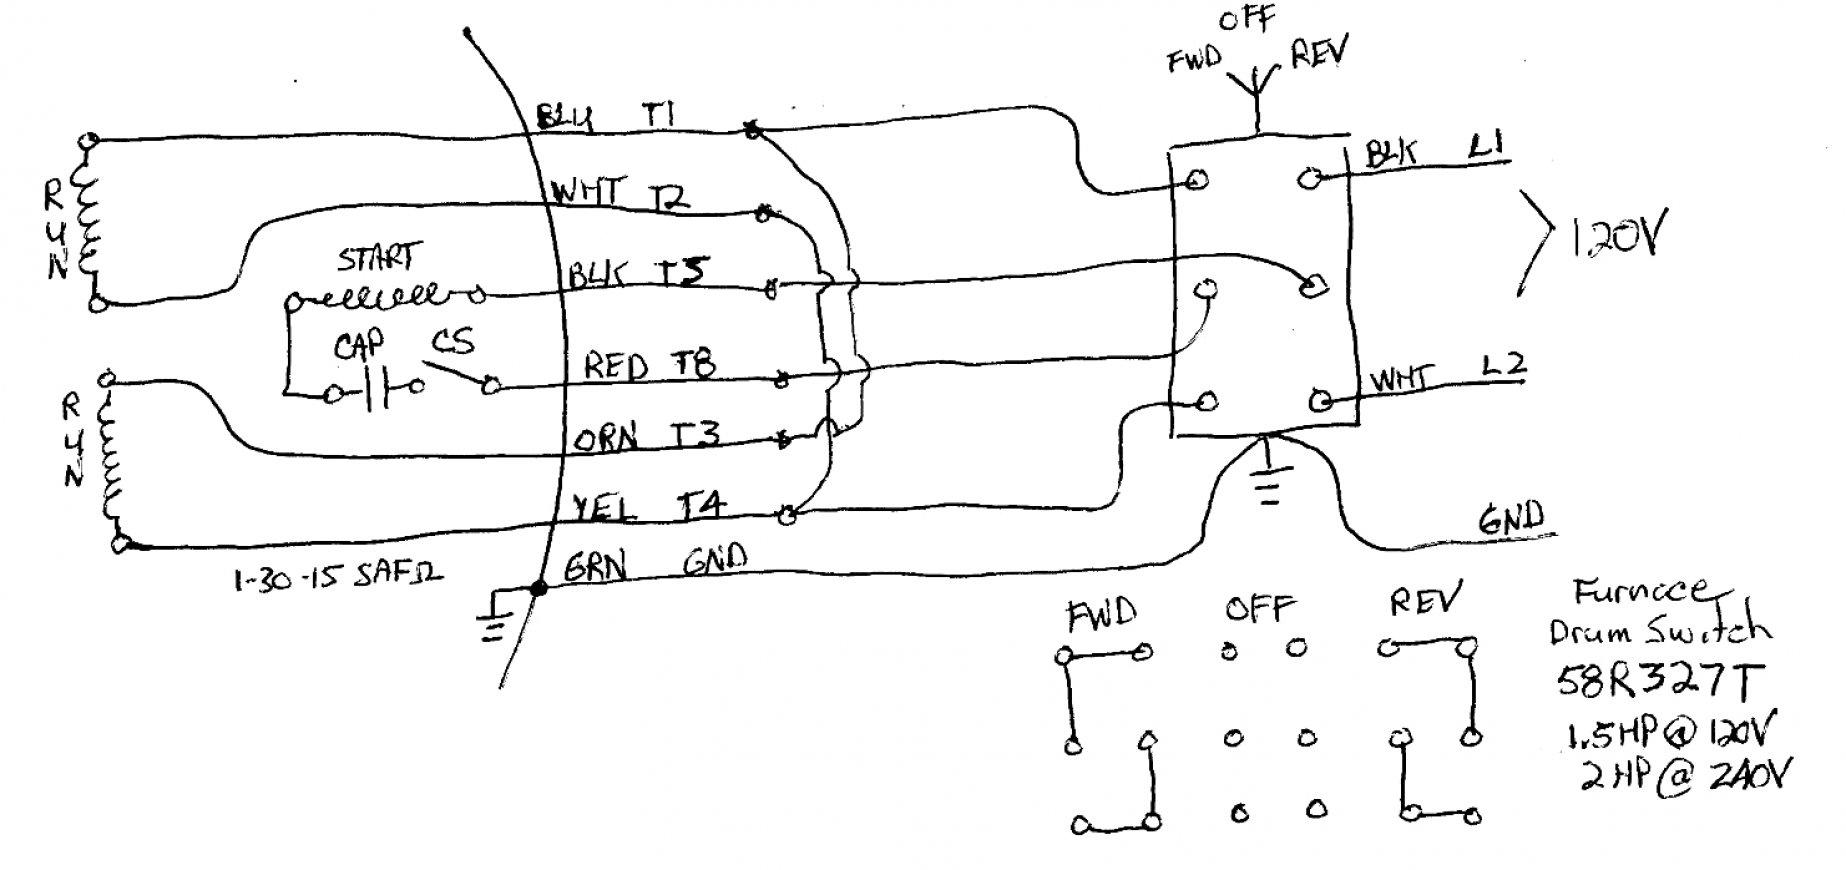 thread 9a motor drum switch wiring help index listing of wiringthree phase drum switch wiring diagrams wiring diagramreversing drum switch wiring 19 5 tramitesyconsultas co \\